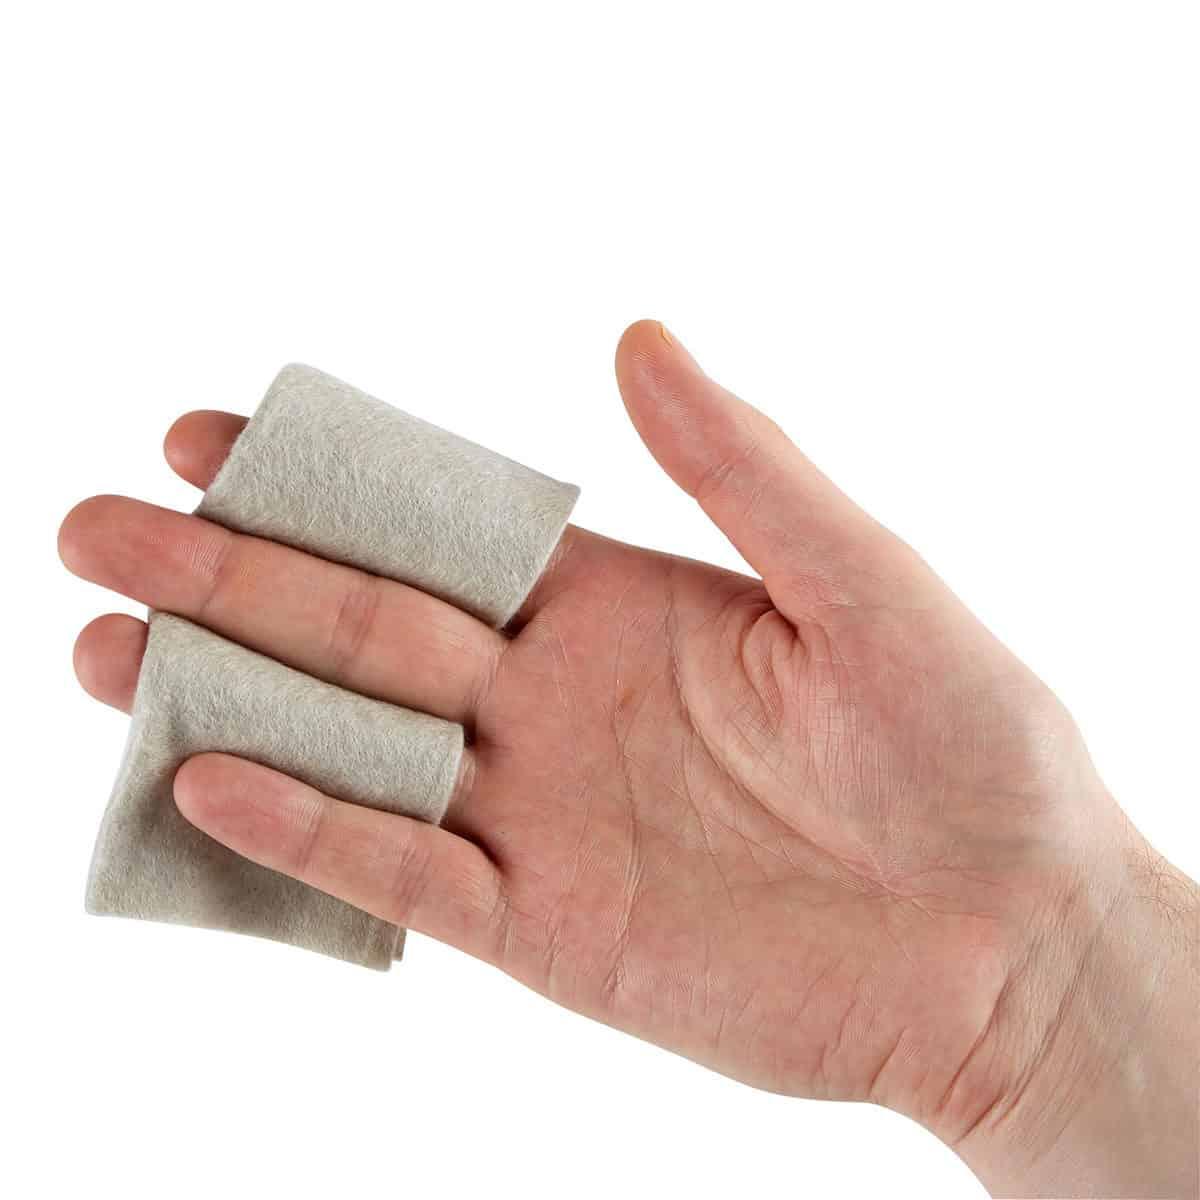 silva pro dressing fingers